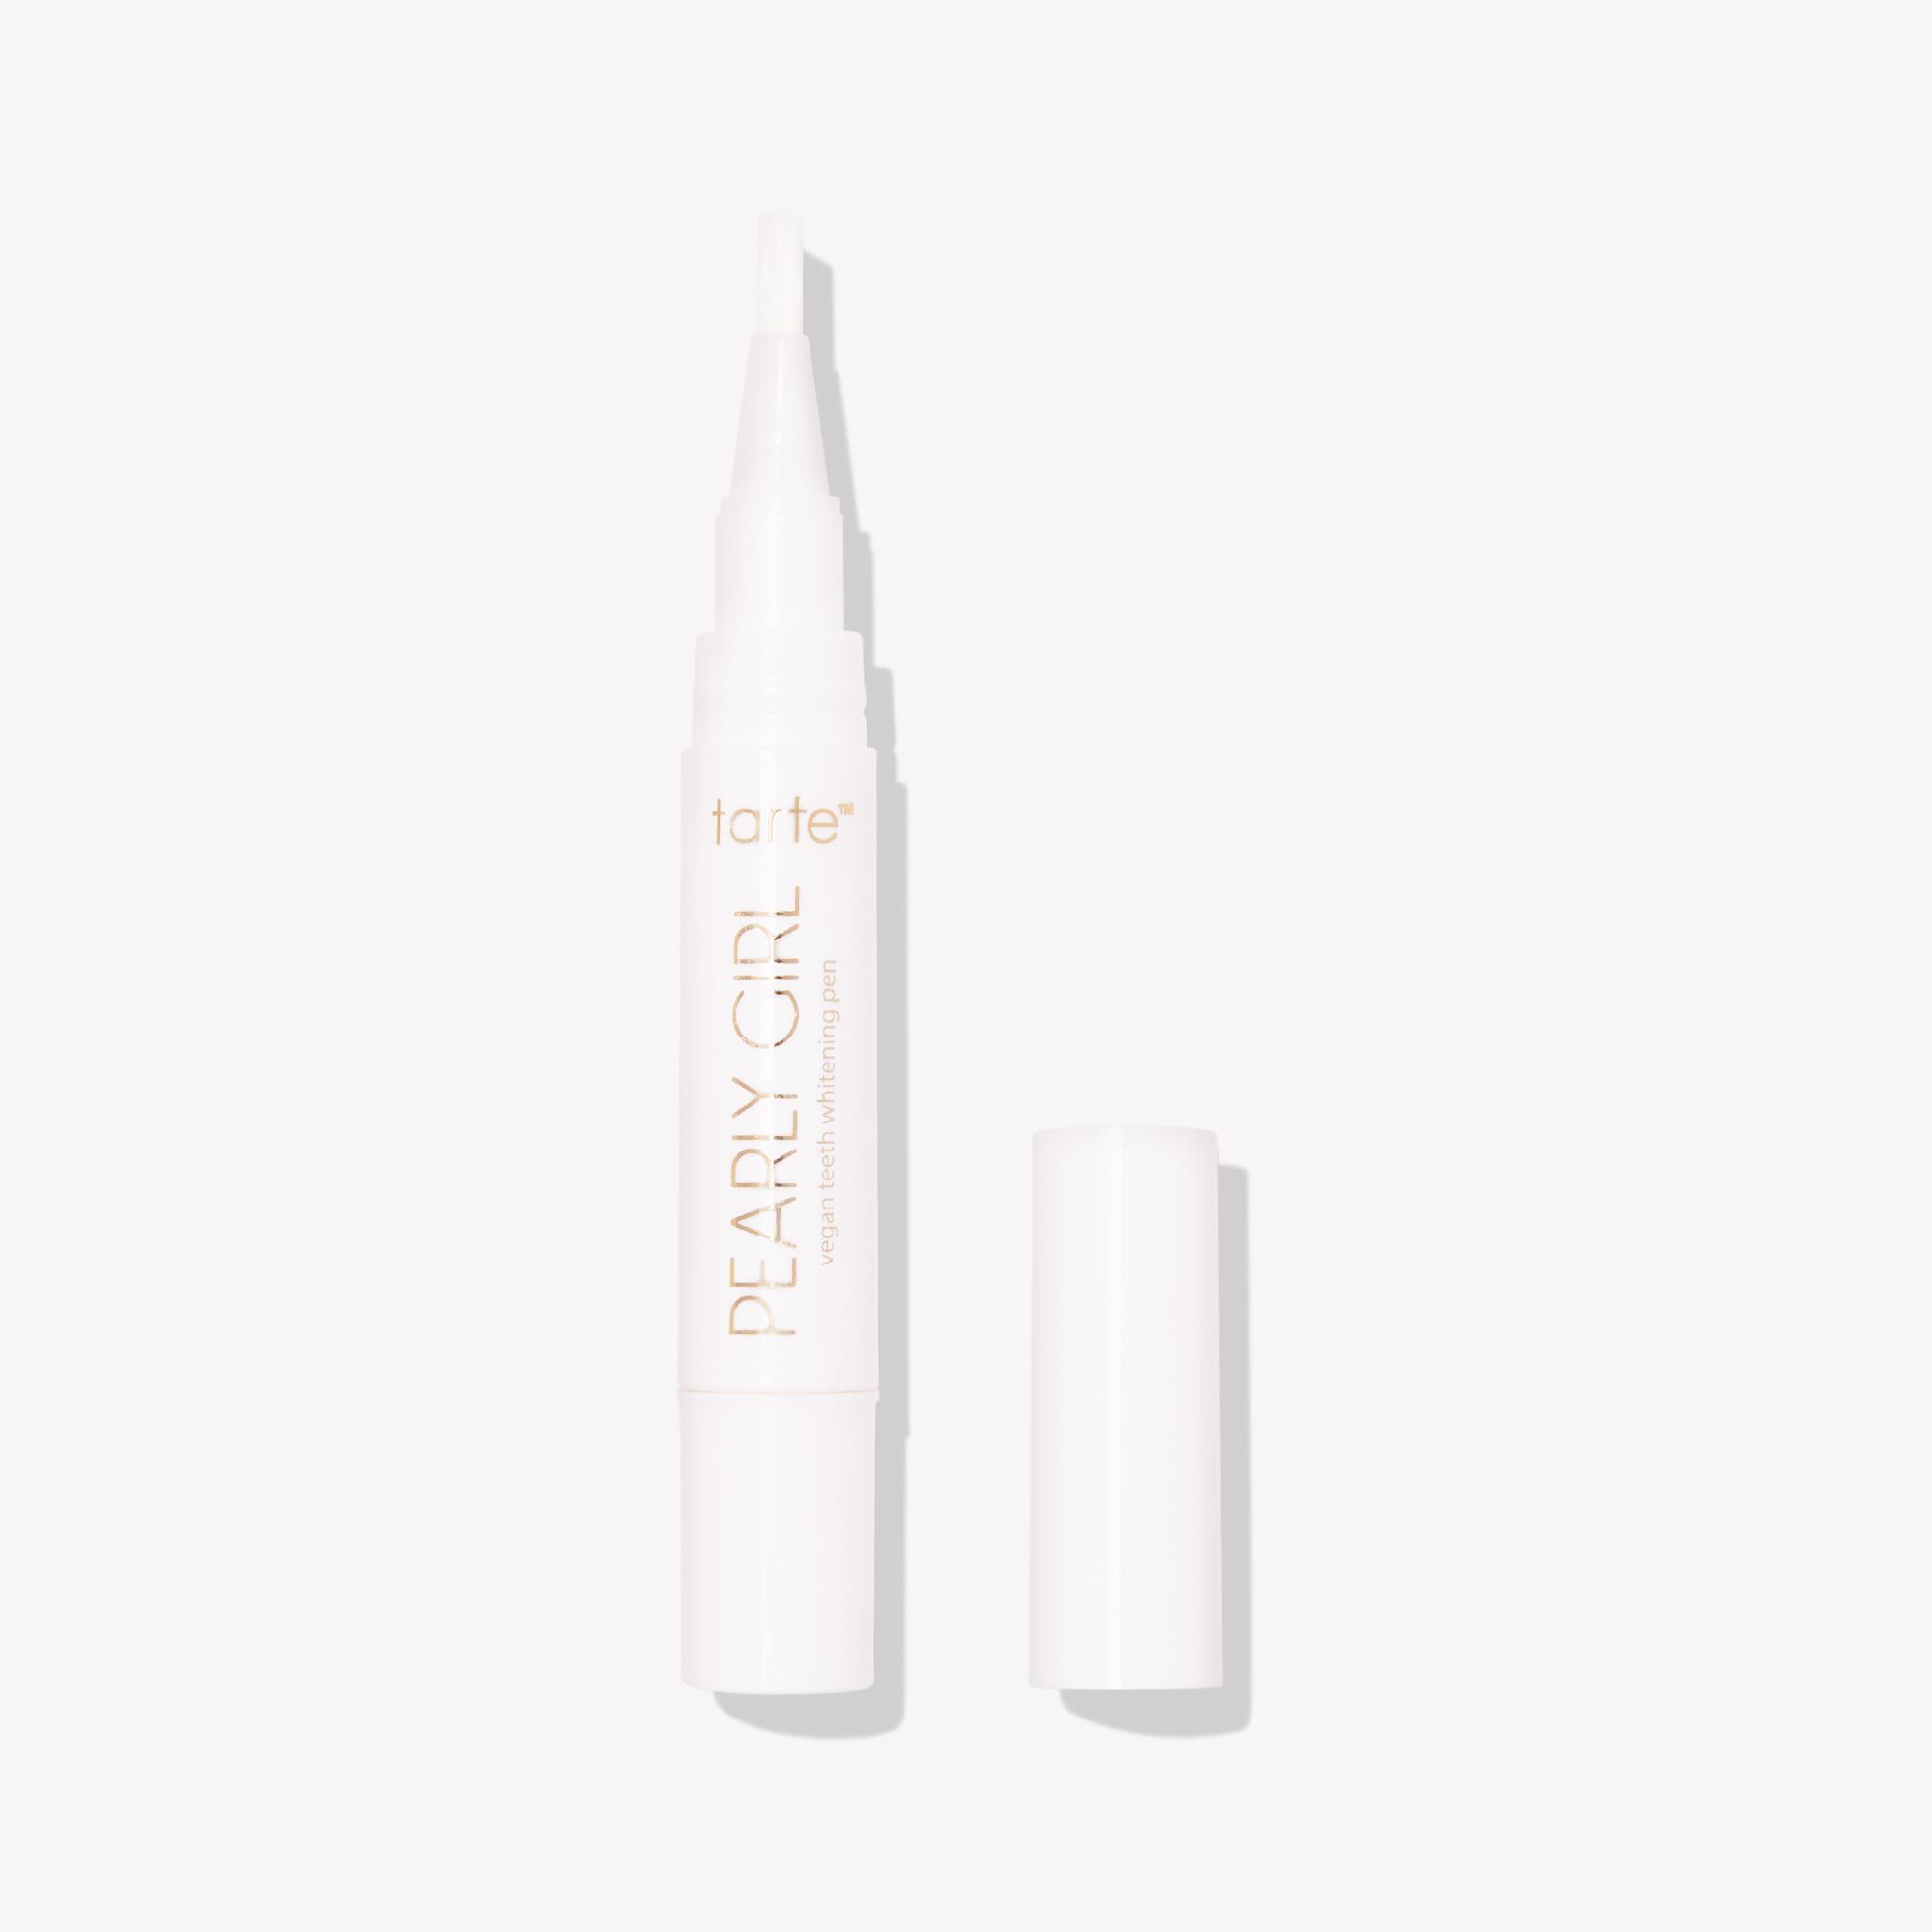 Pearly Girl Vegan Teeth Whitening Pen Tarte Cosmetics